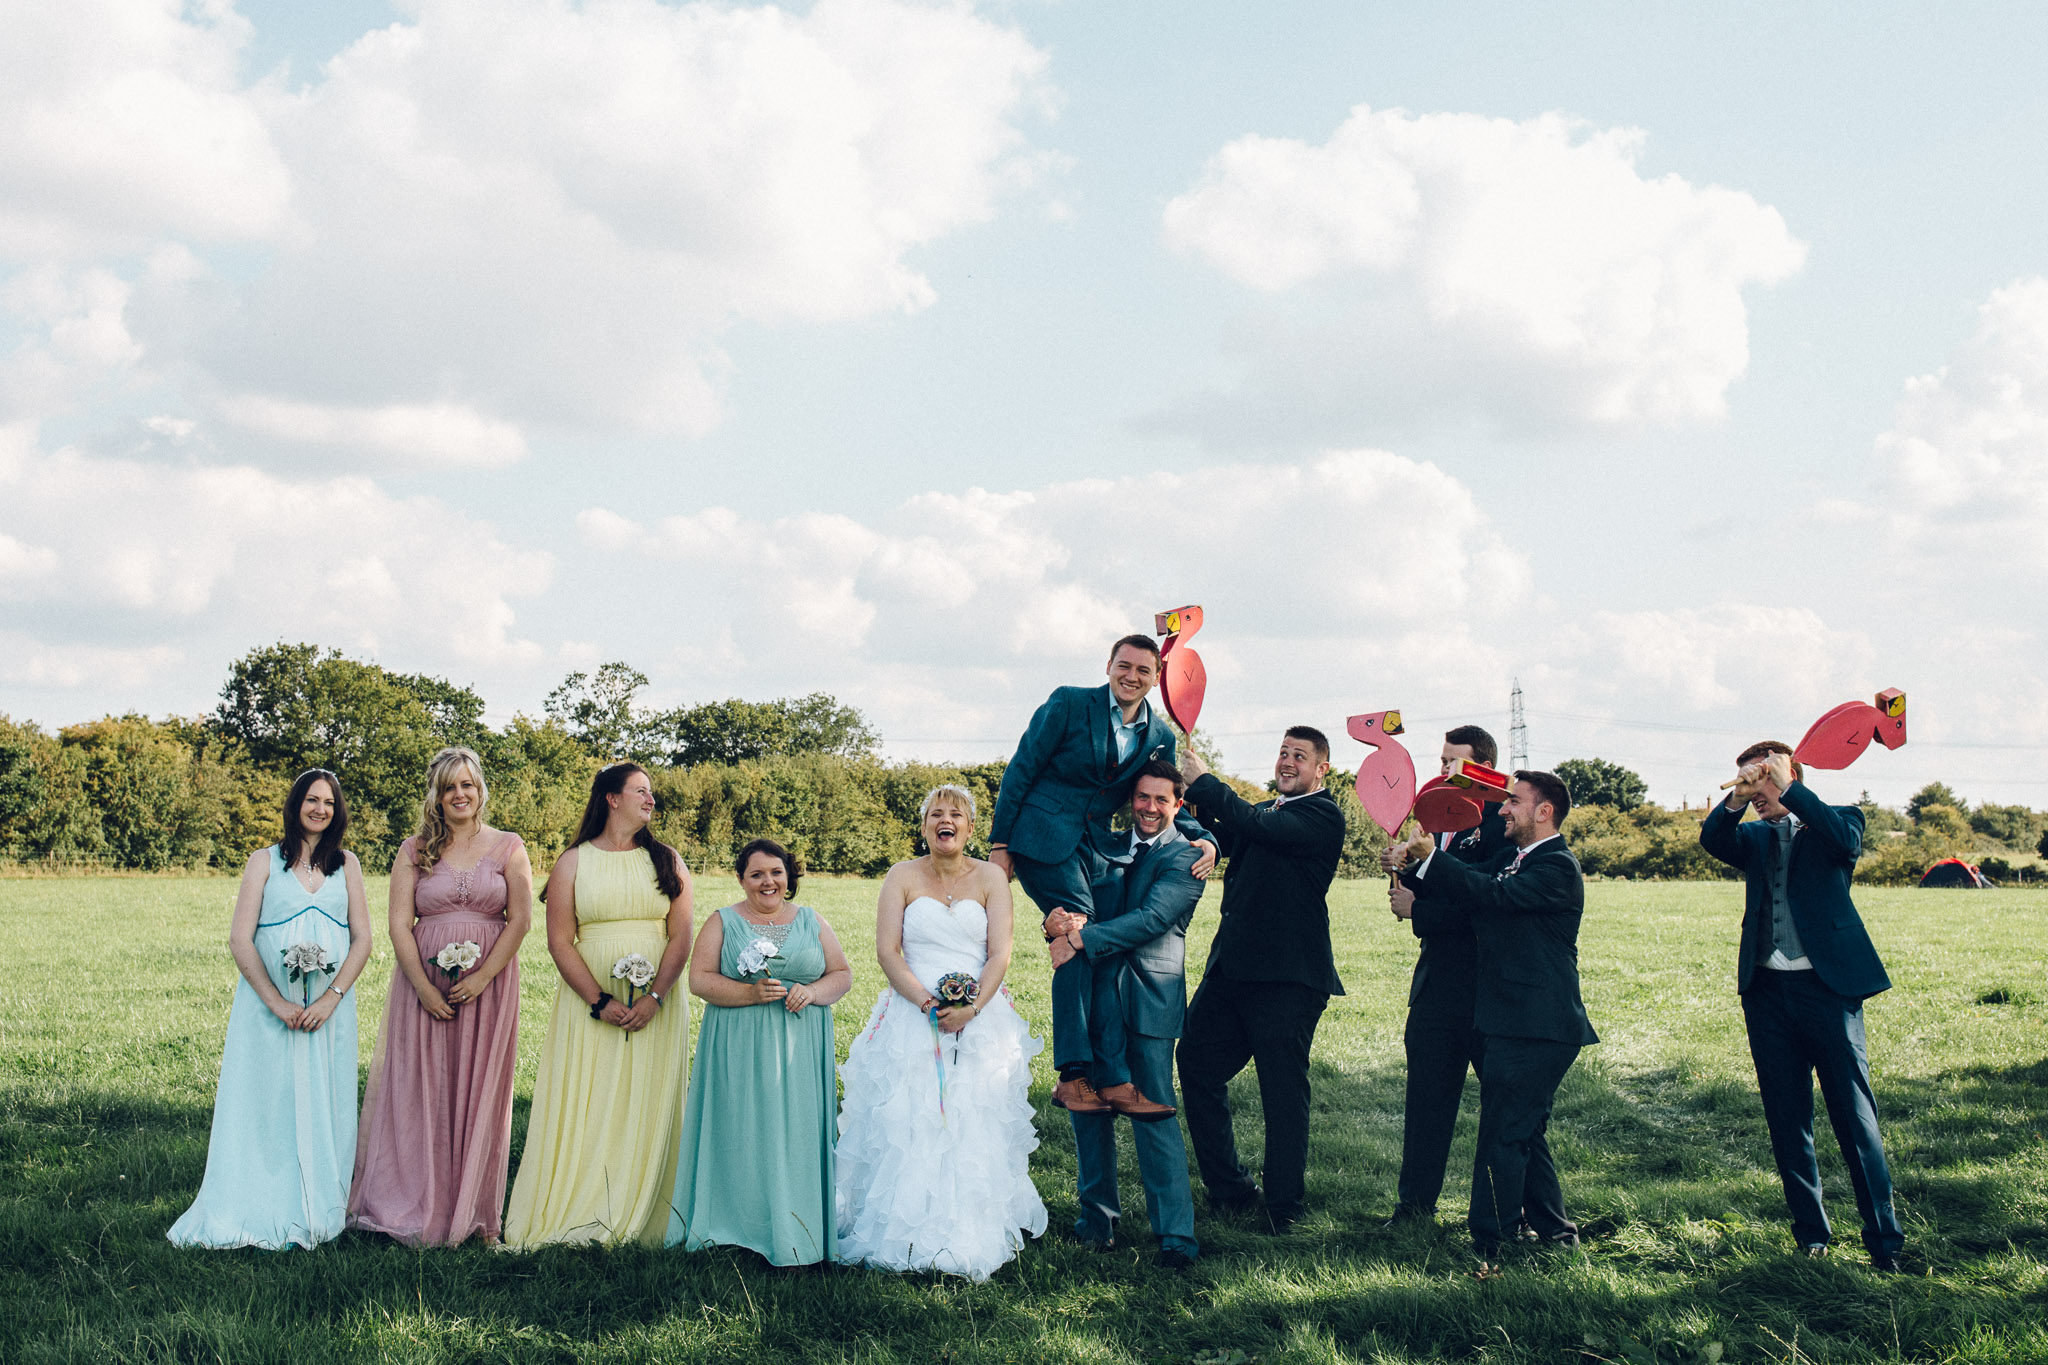 Fun Group Photo Alternative Wedding Photography - I Do The Country Wed, Quainton